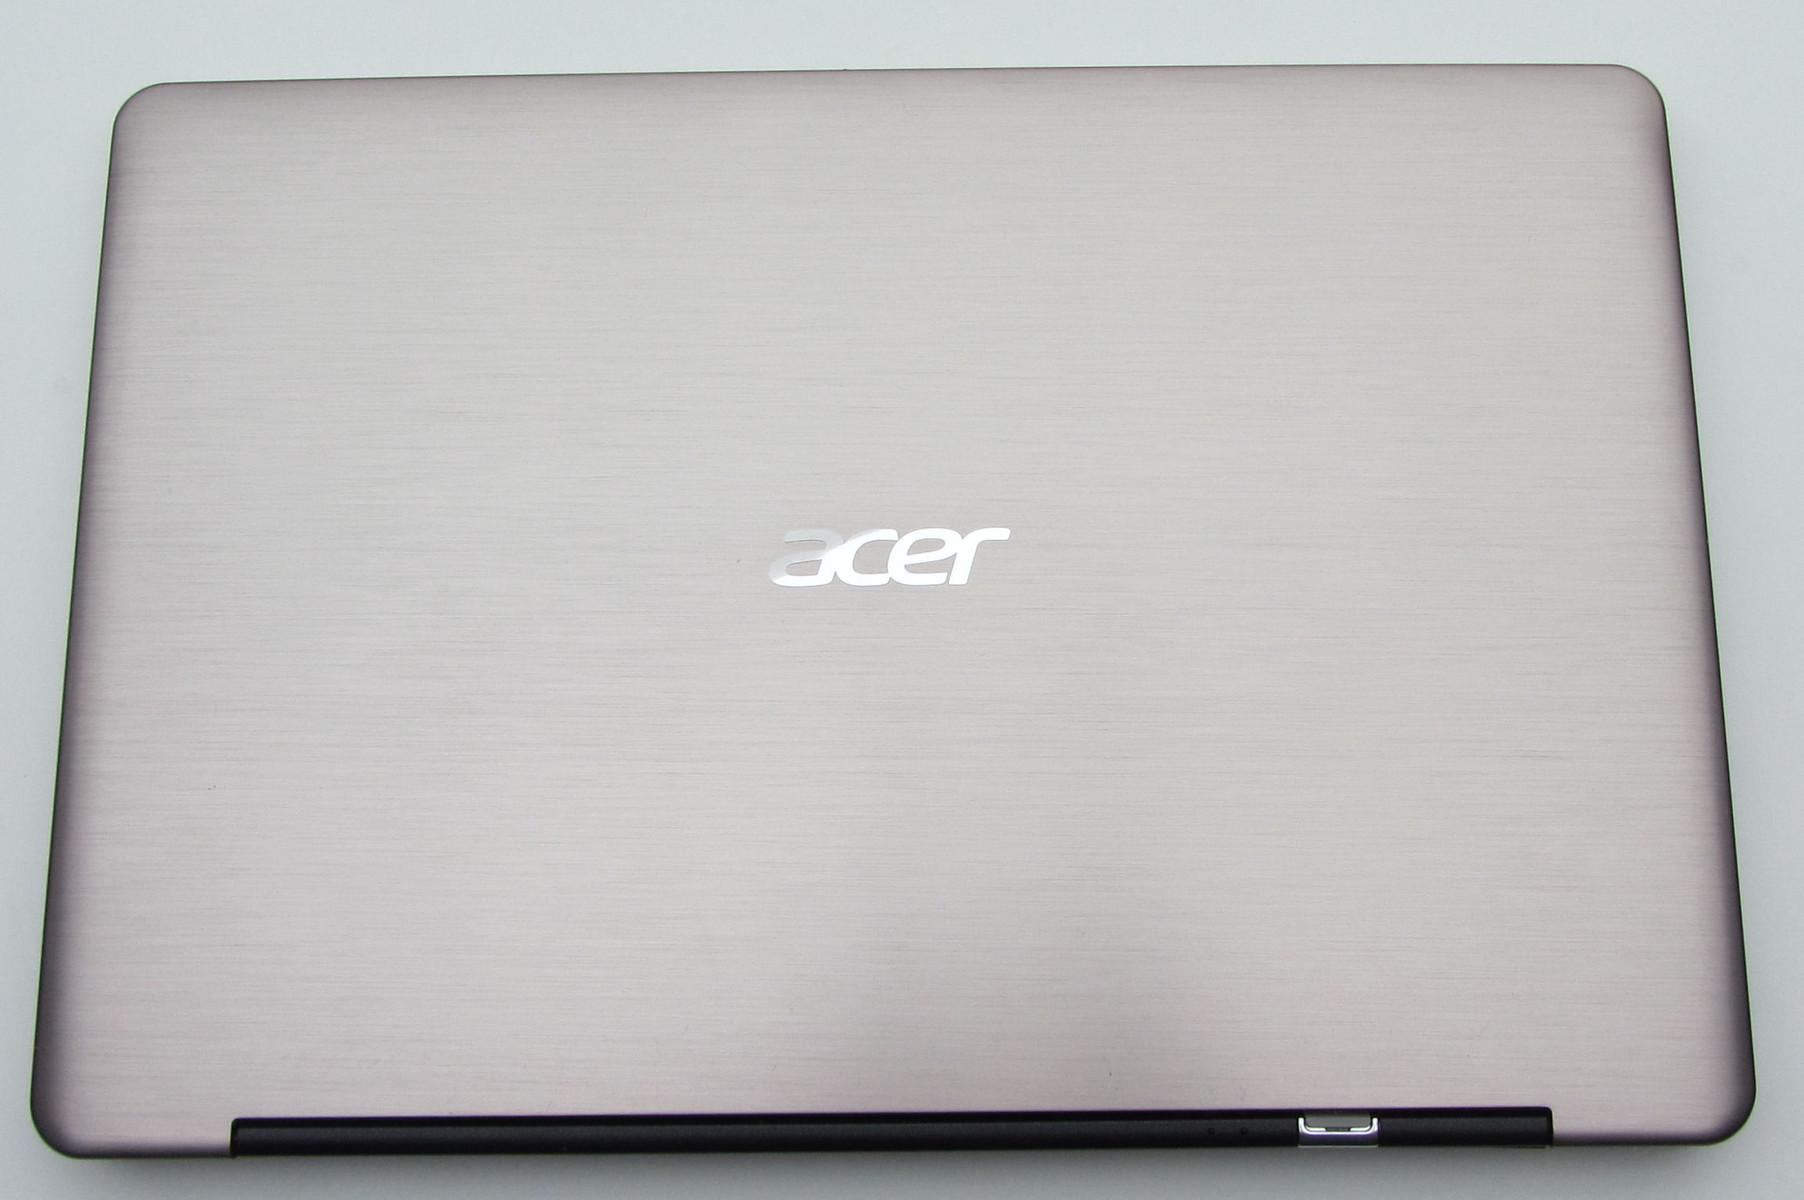 Acer Aspire S3-951 Atheros WLAN Drivers (2019)